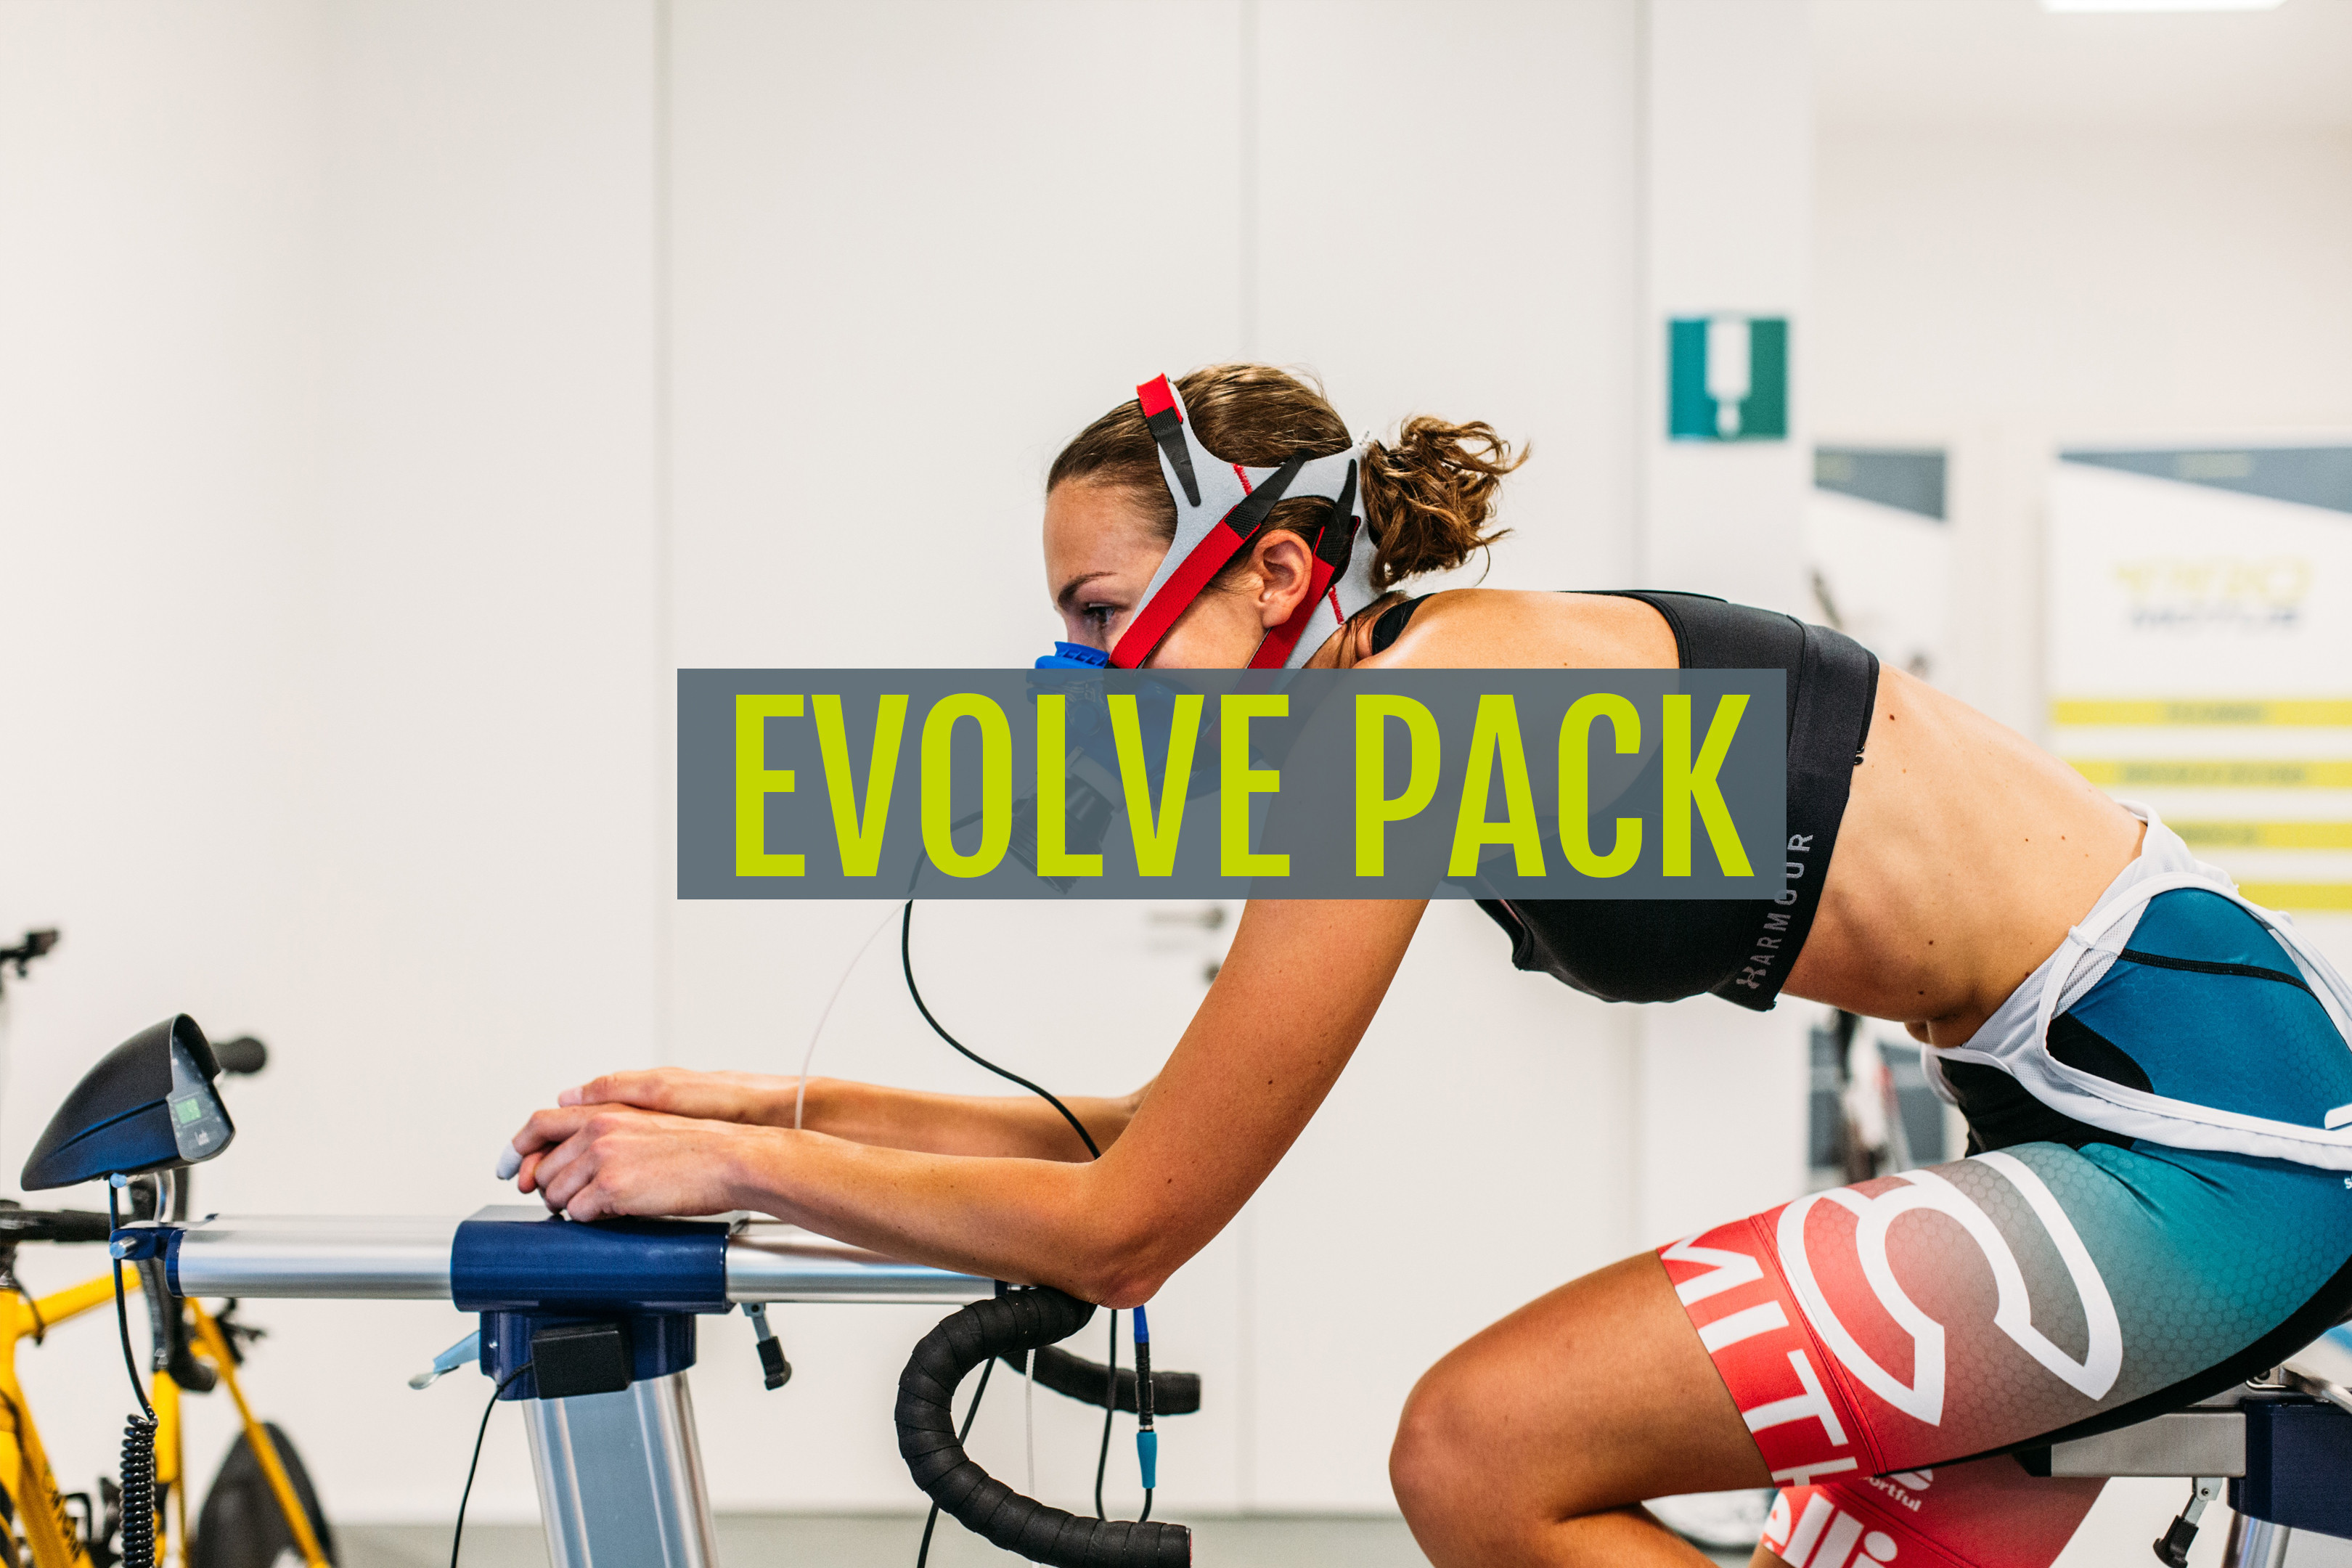 MTB - Evolve Pack